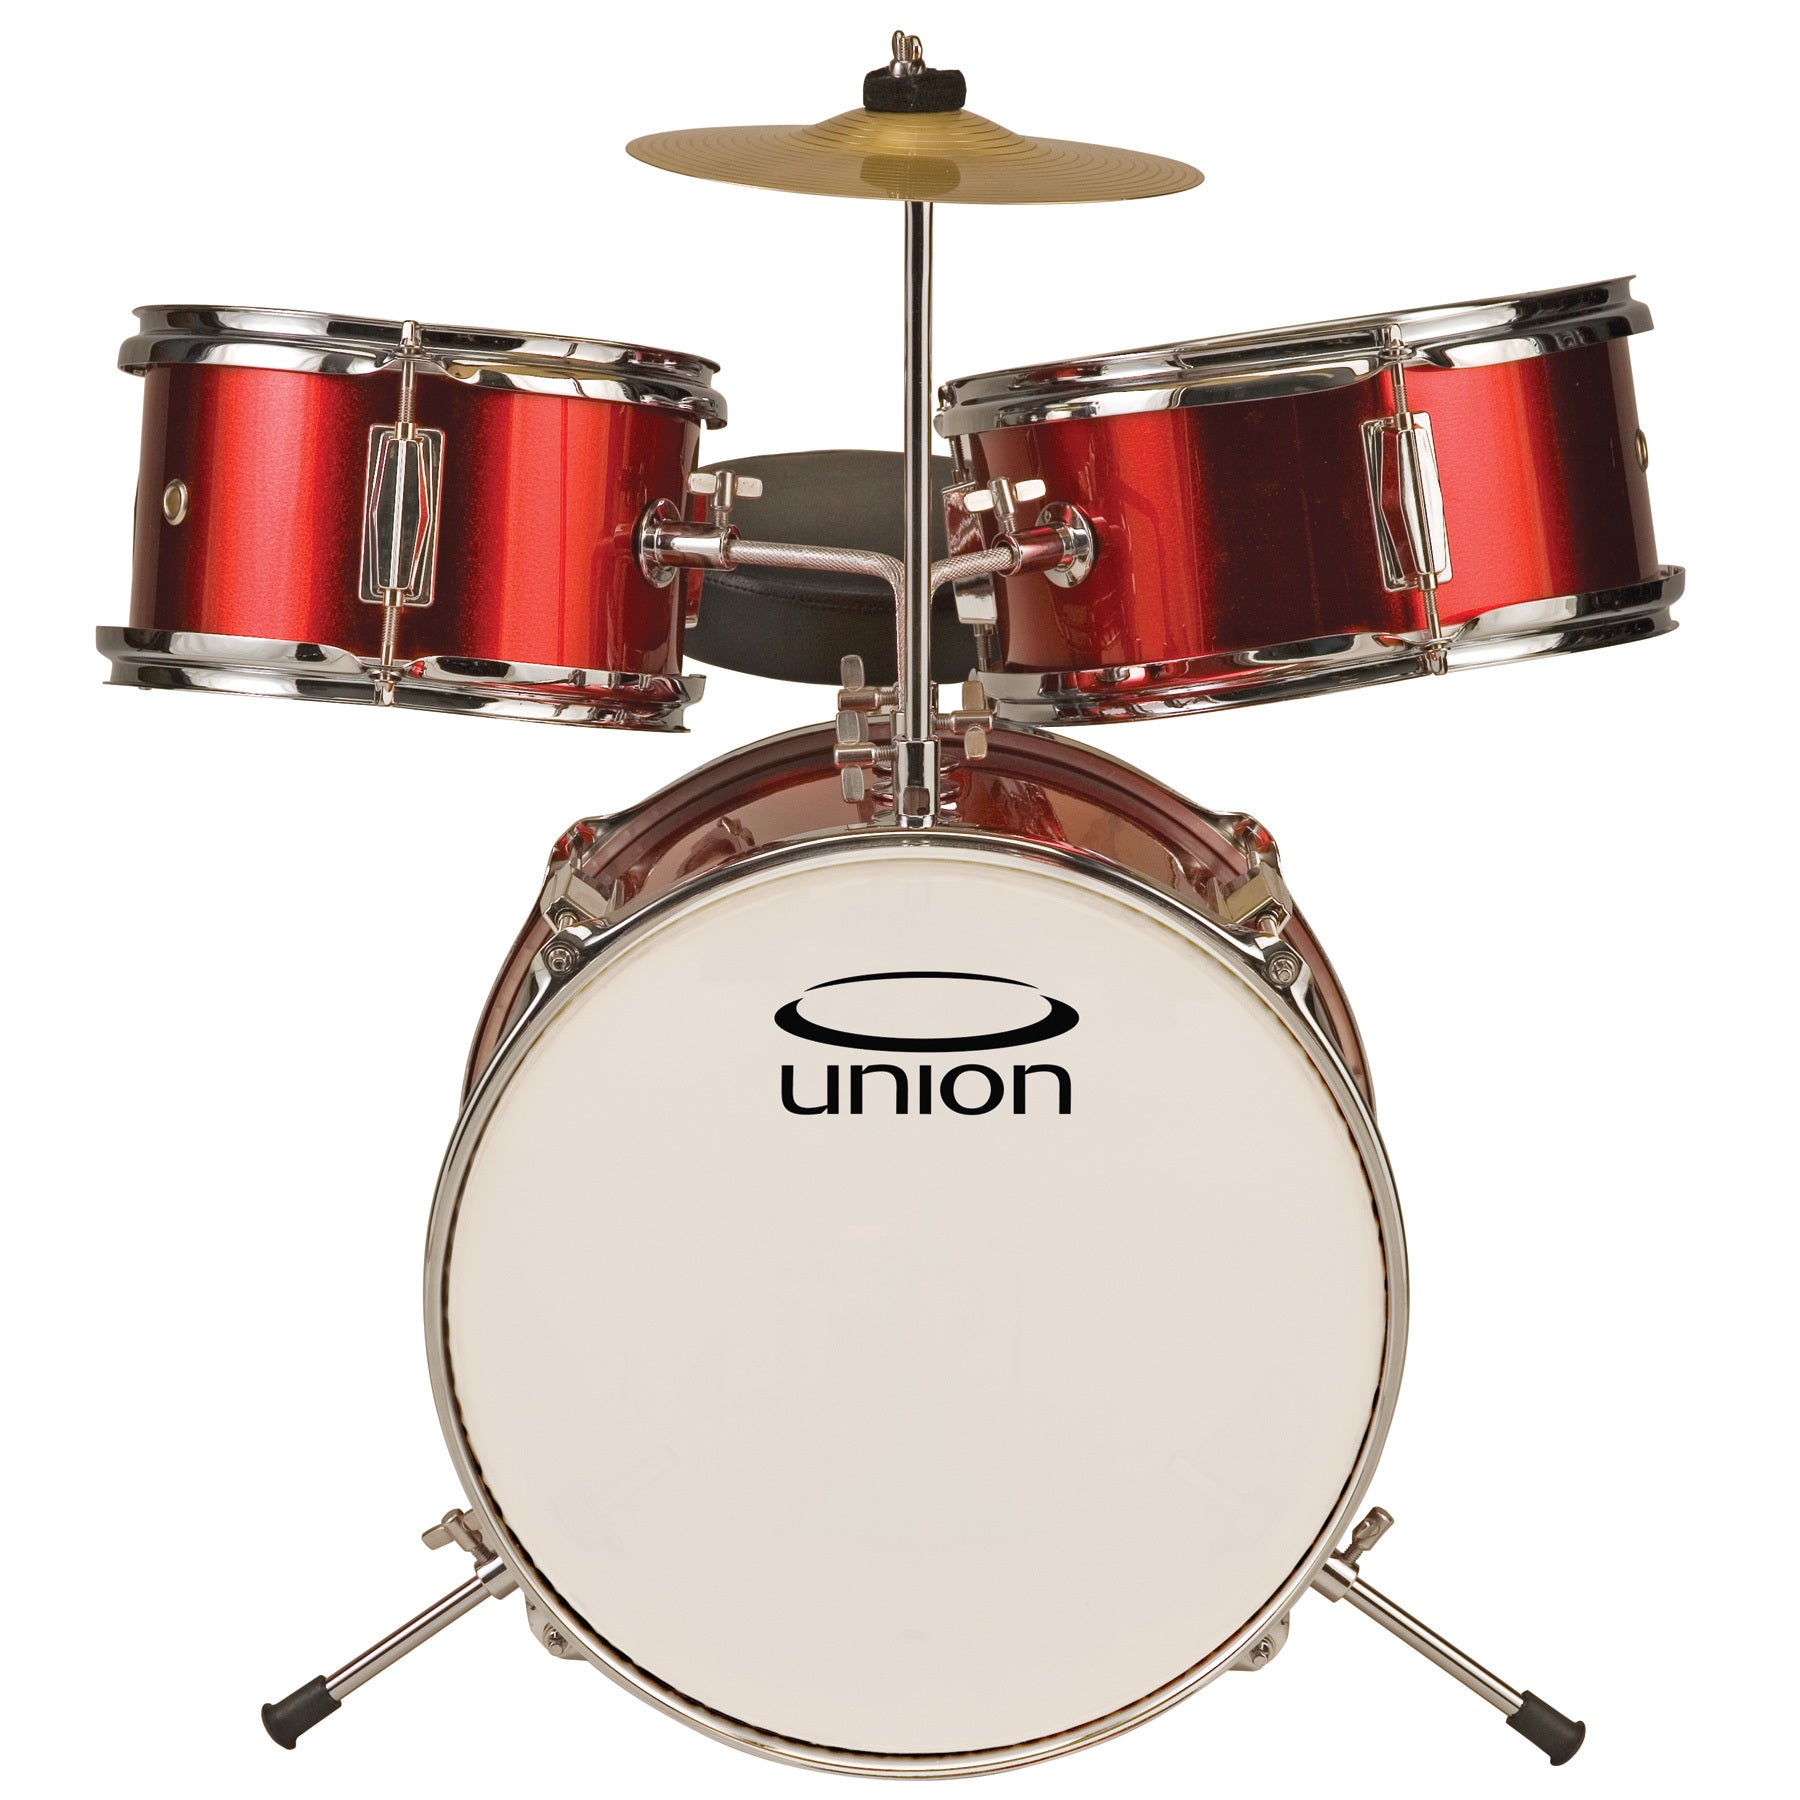 UNION UT3 3-piece Metallic Red Toy Drum Set (Red)